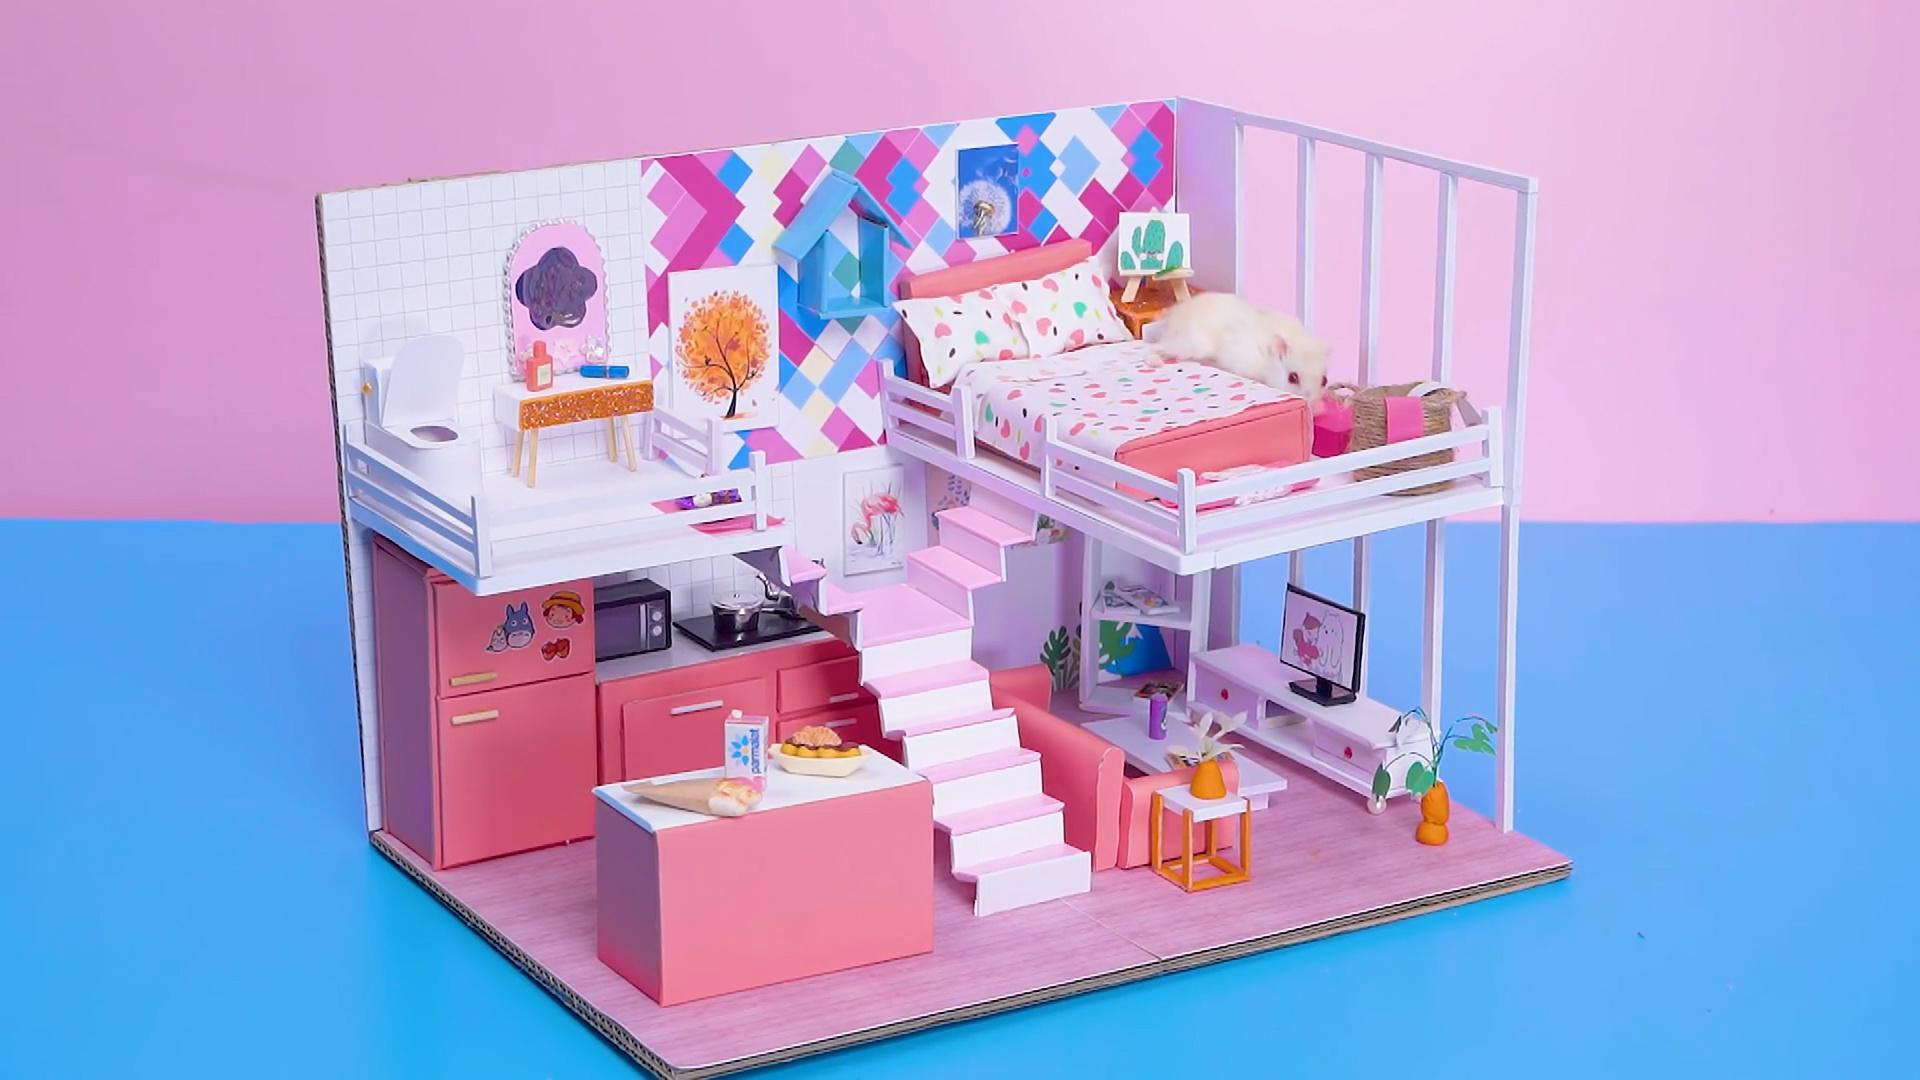 DIY迷你娃娃屋,小仓鼠的大大落地窗房间